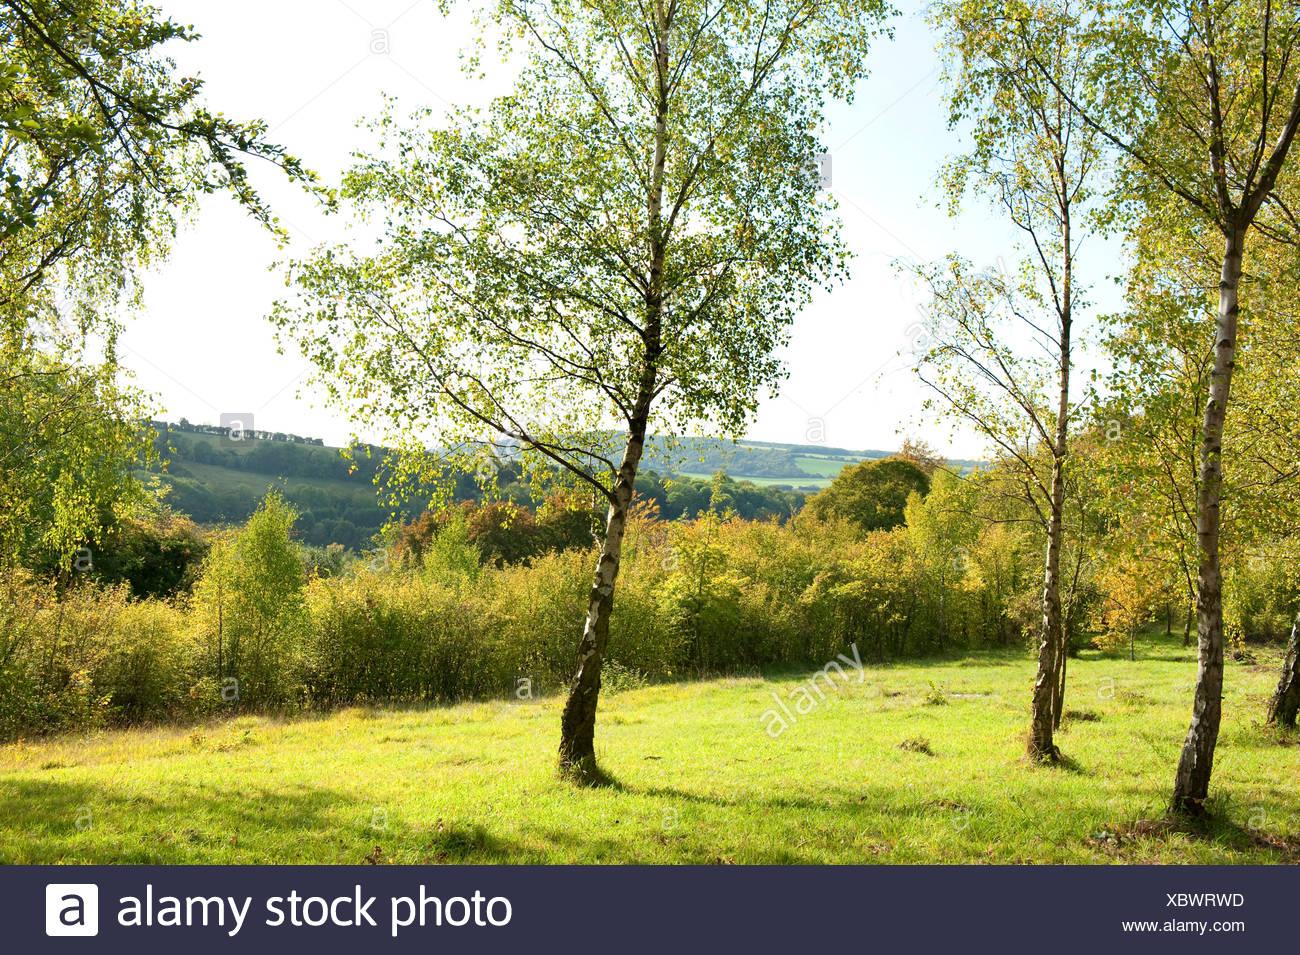 Silver Birch Trees Betula pendula Ranscombe Farm Nature Reserve Kent UK - Stock Image